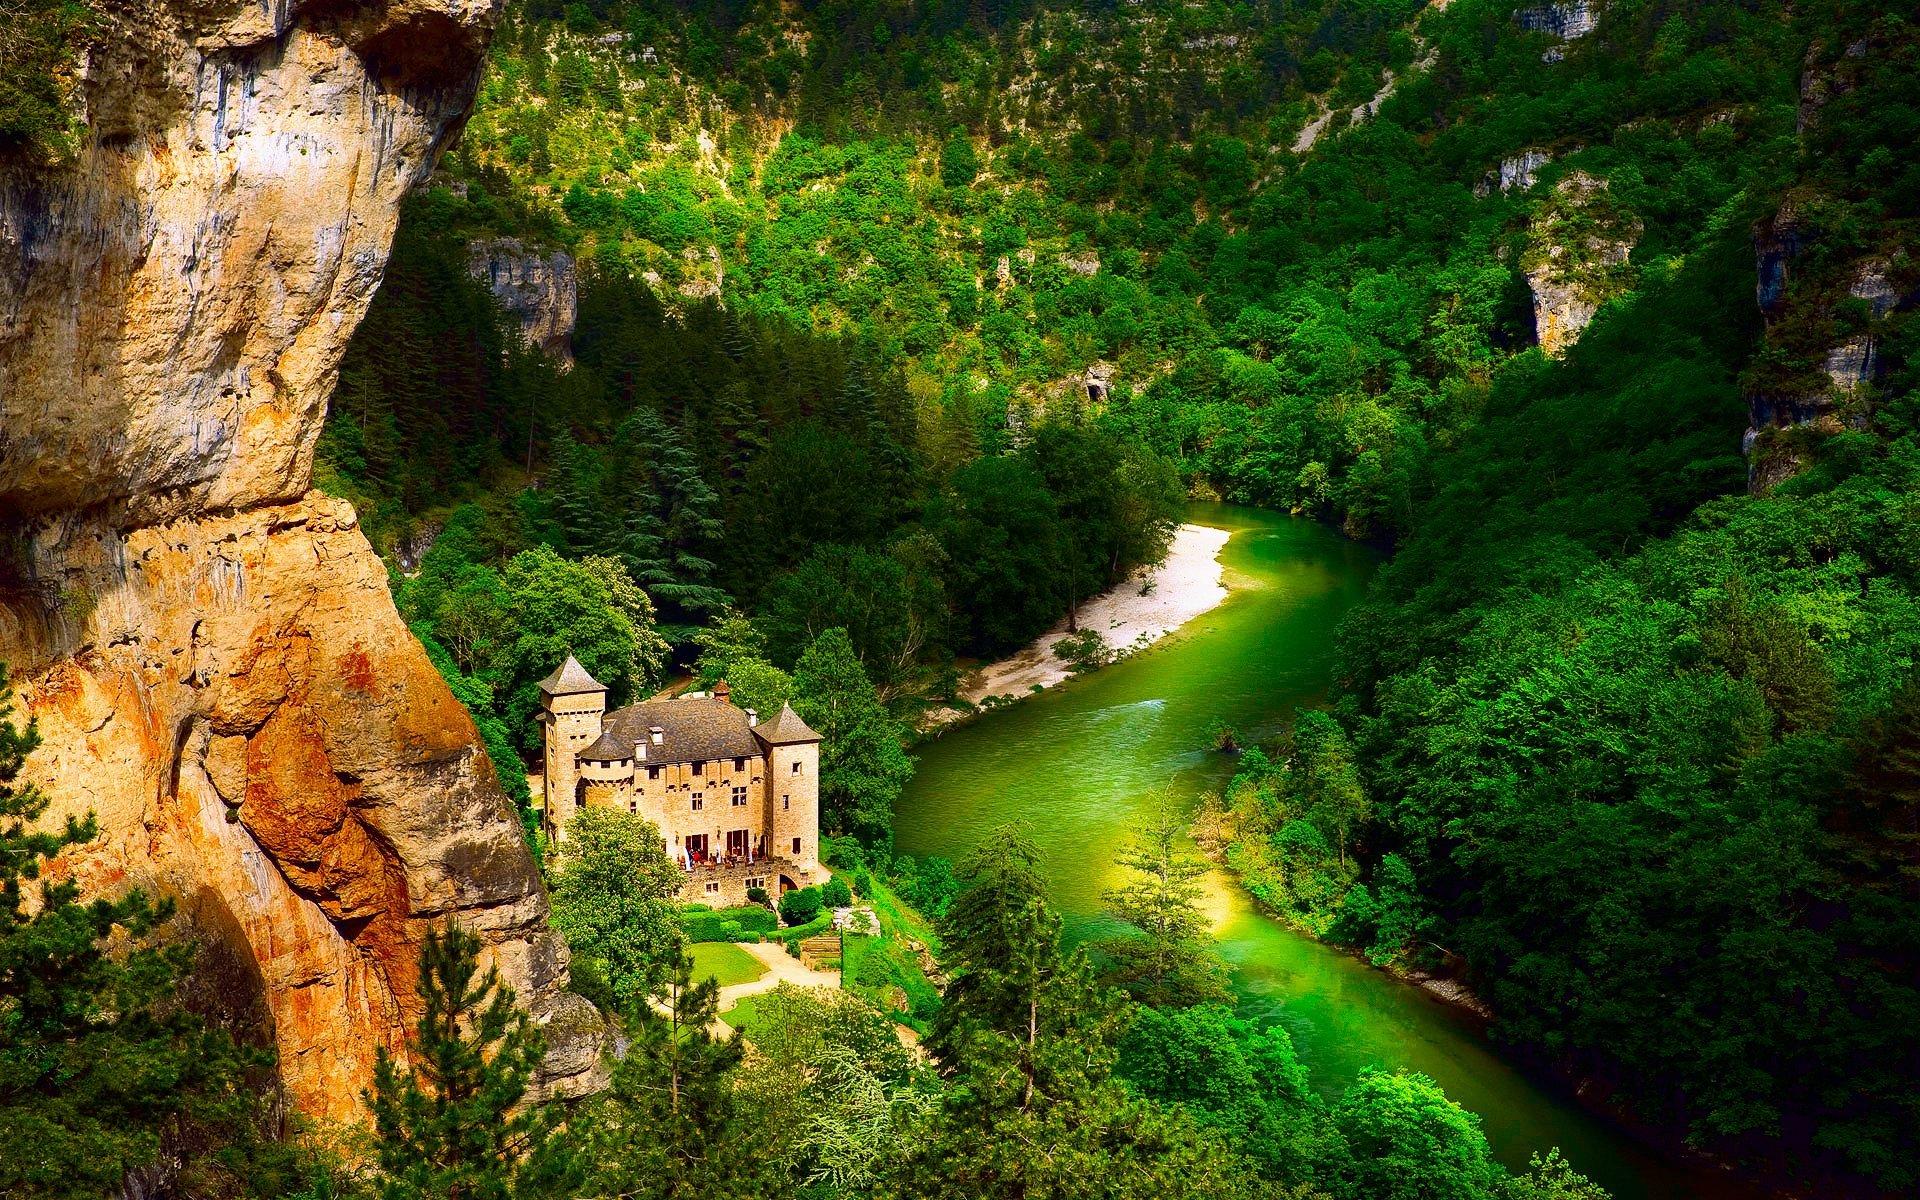 france-laval-castle-river-mountain-forest.jpg